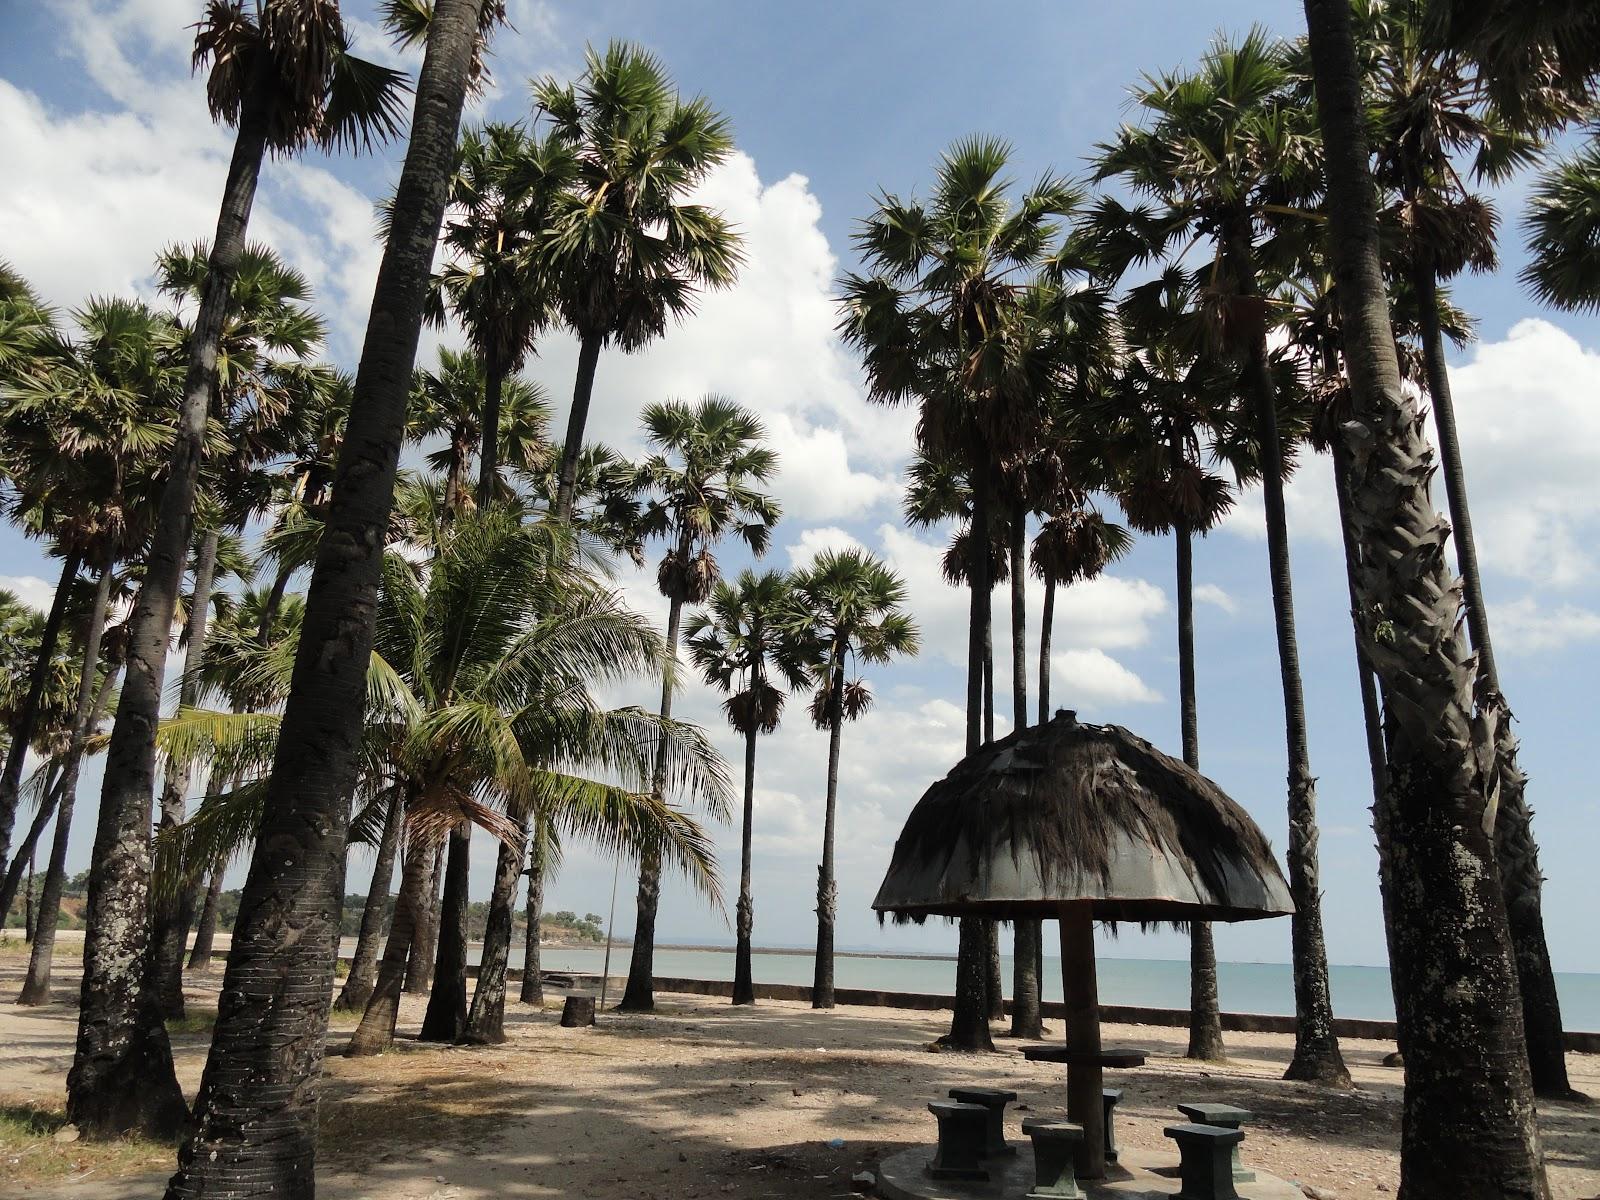 16 Tempat Wisata Nusa Tenggara Timur Ntt Mengasyikkan Pantai Pasir